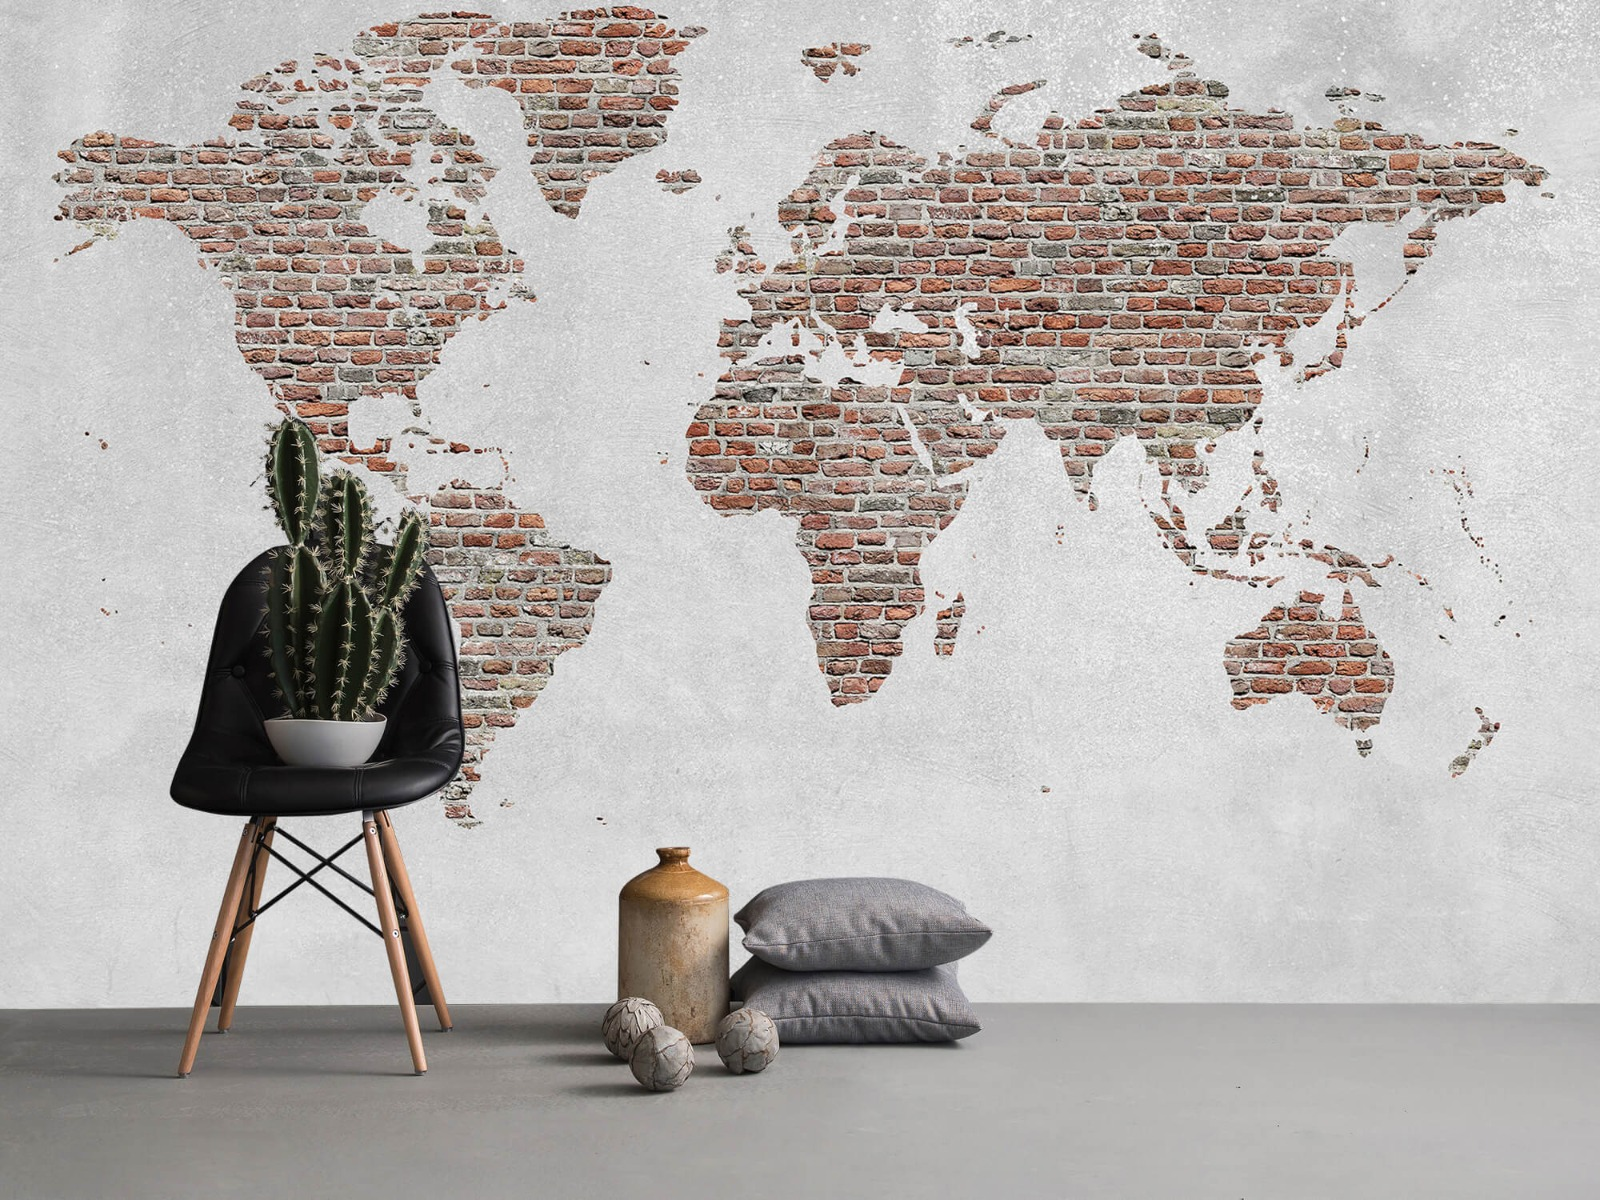 Steen behang - Wereldkaart stenen - Slaapkamer 13